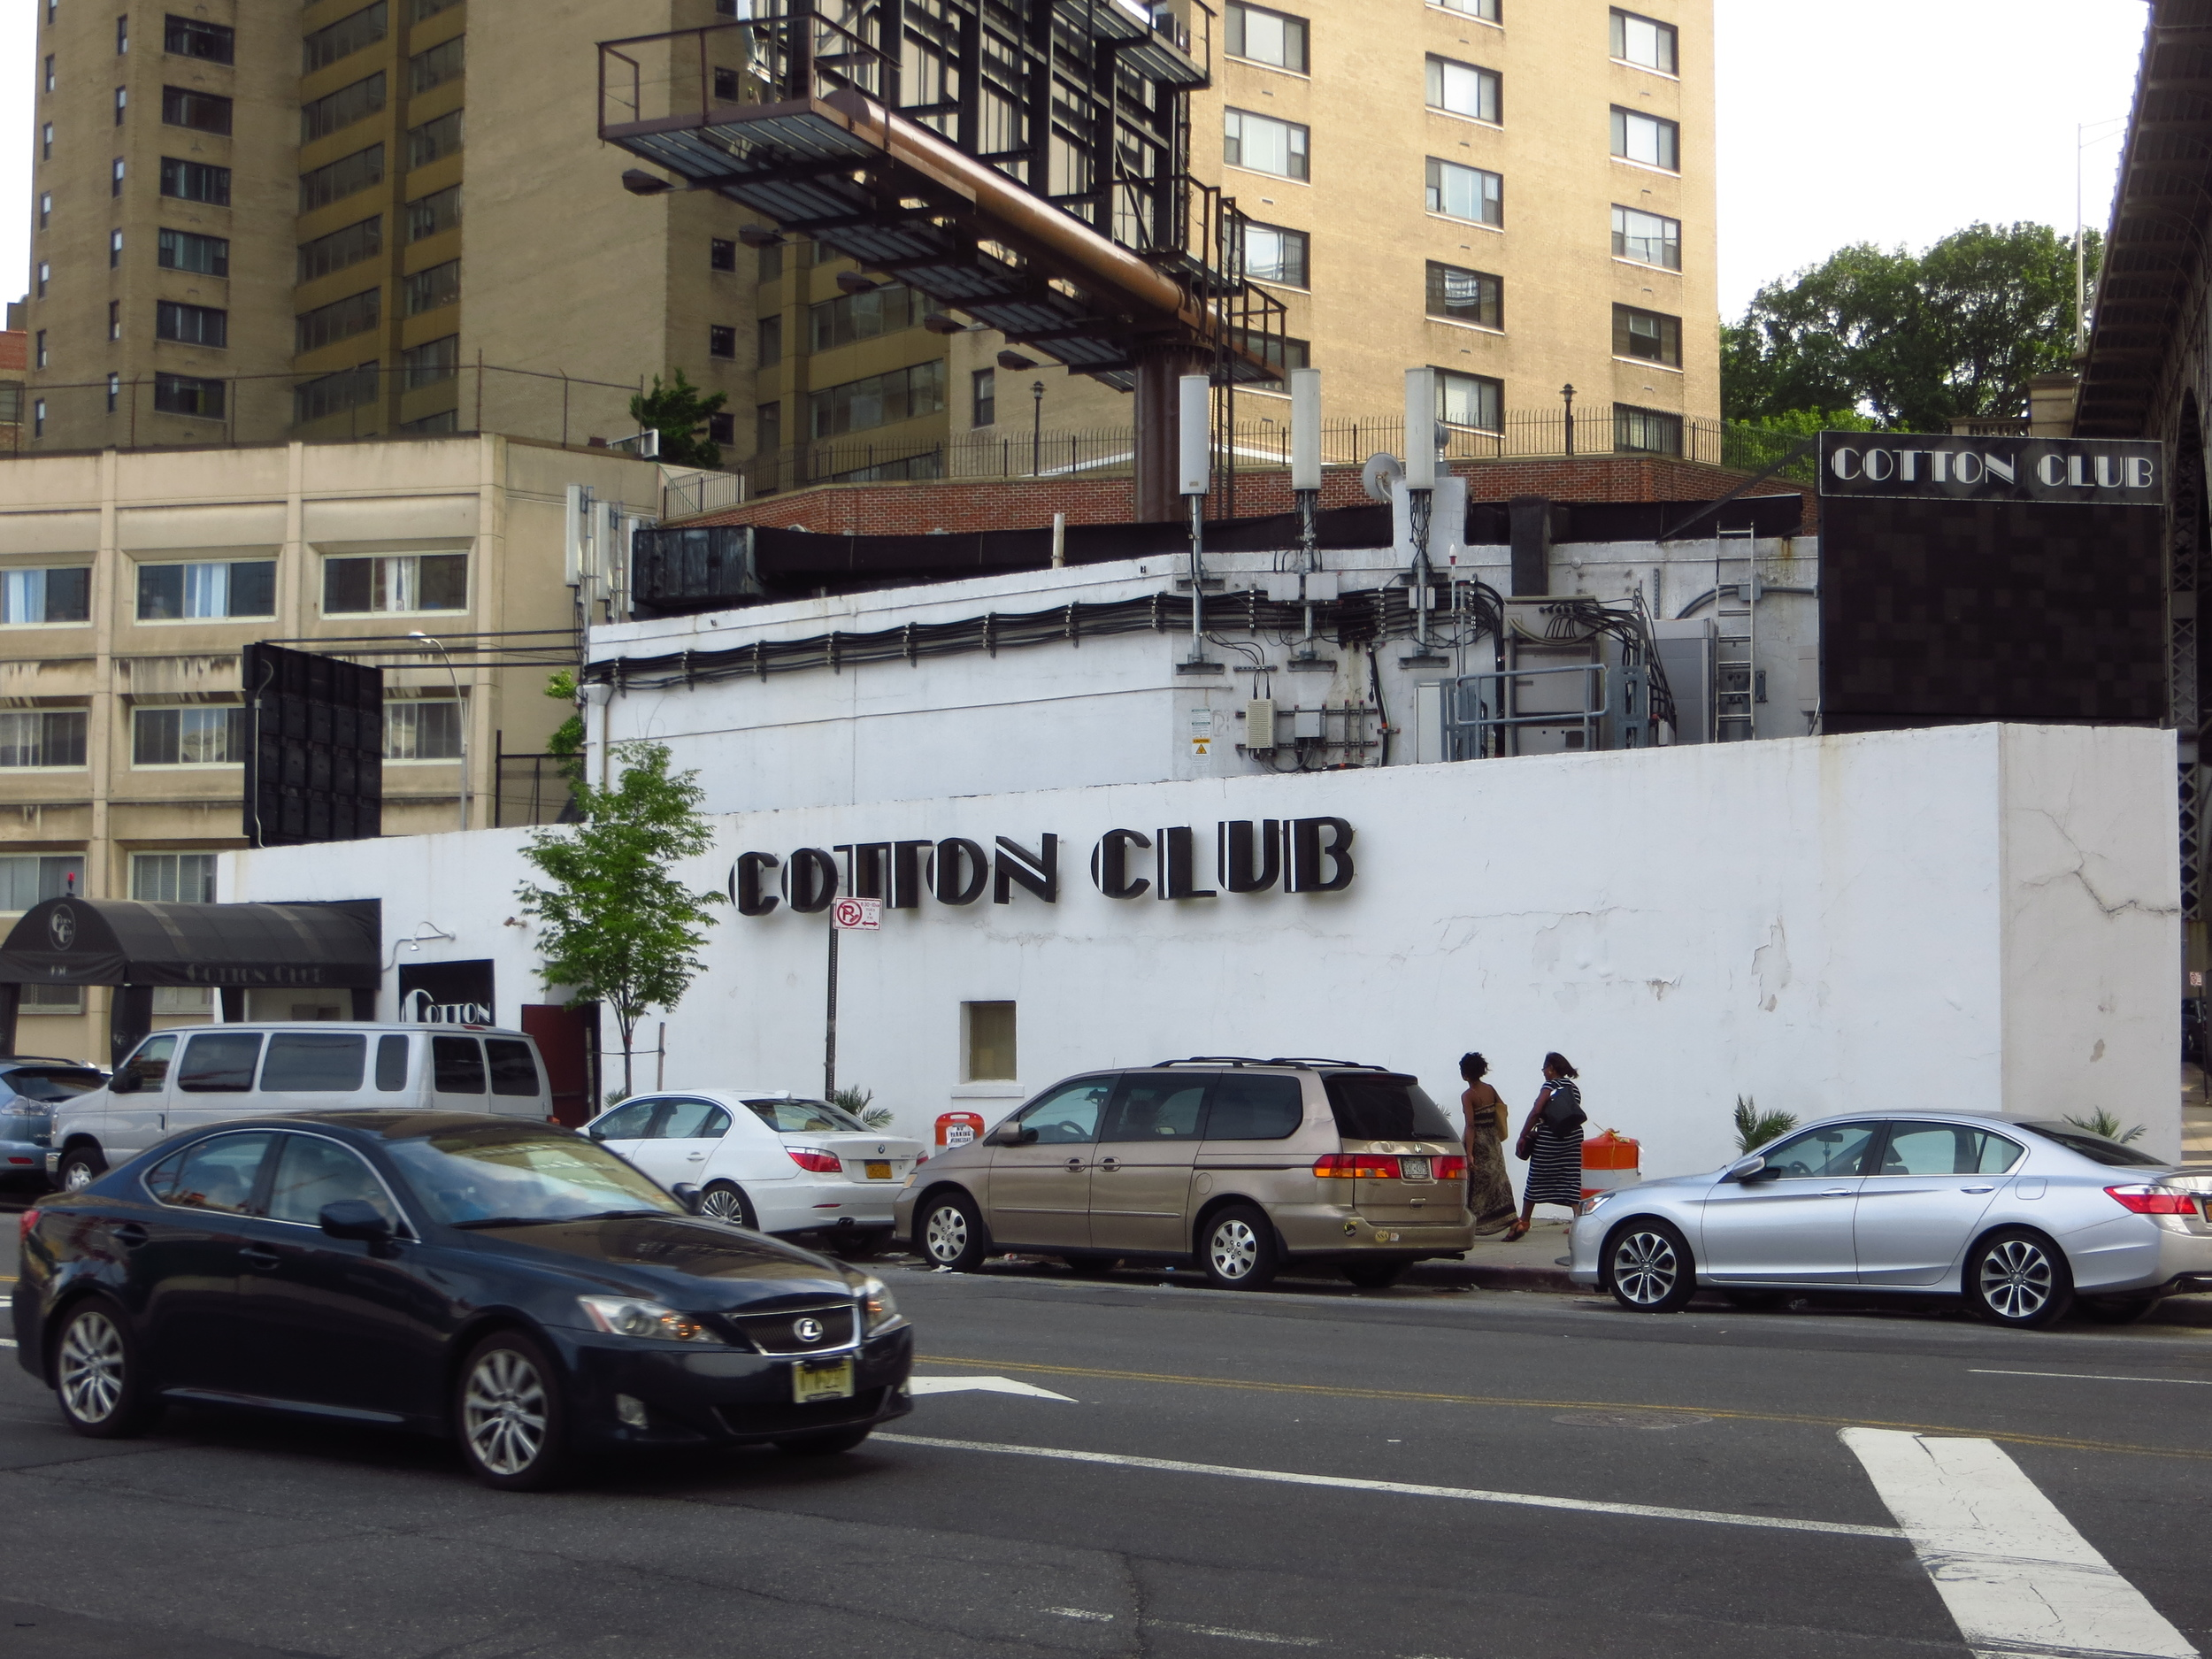 Reincarnated Cotton Club